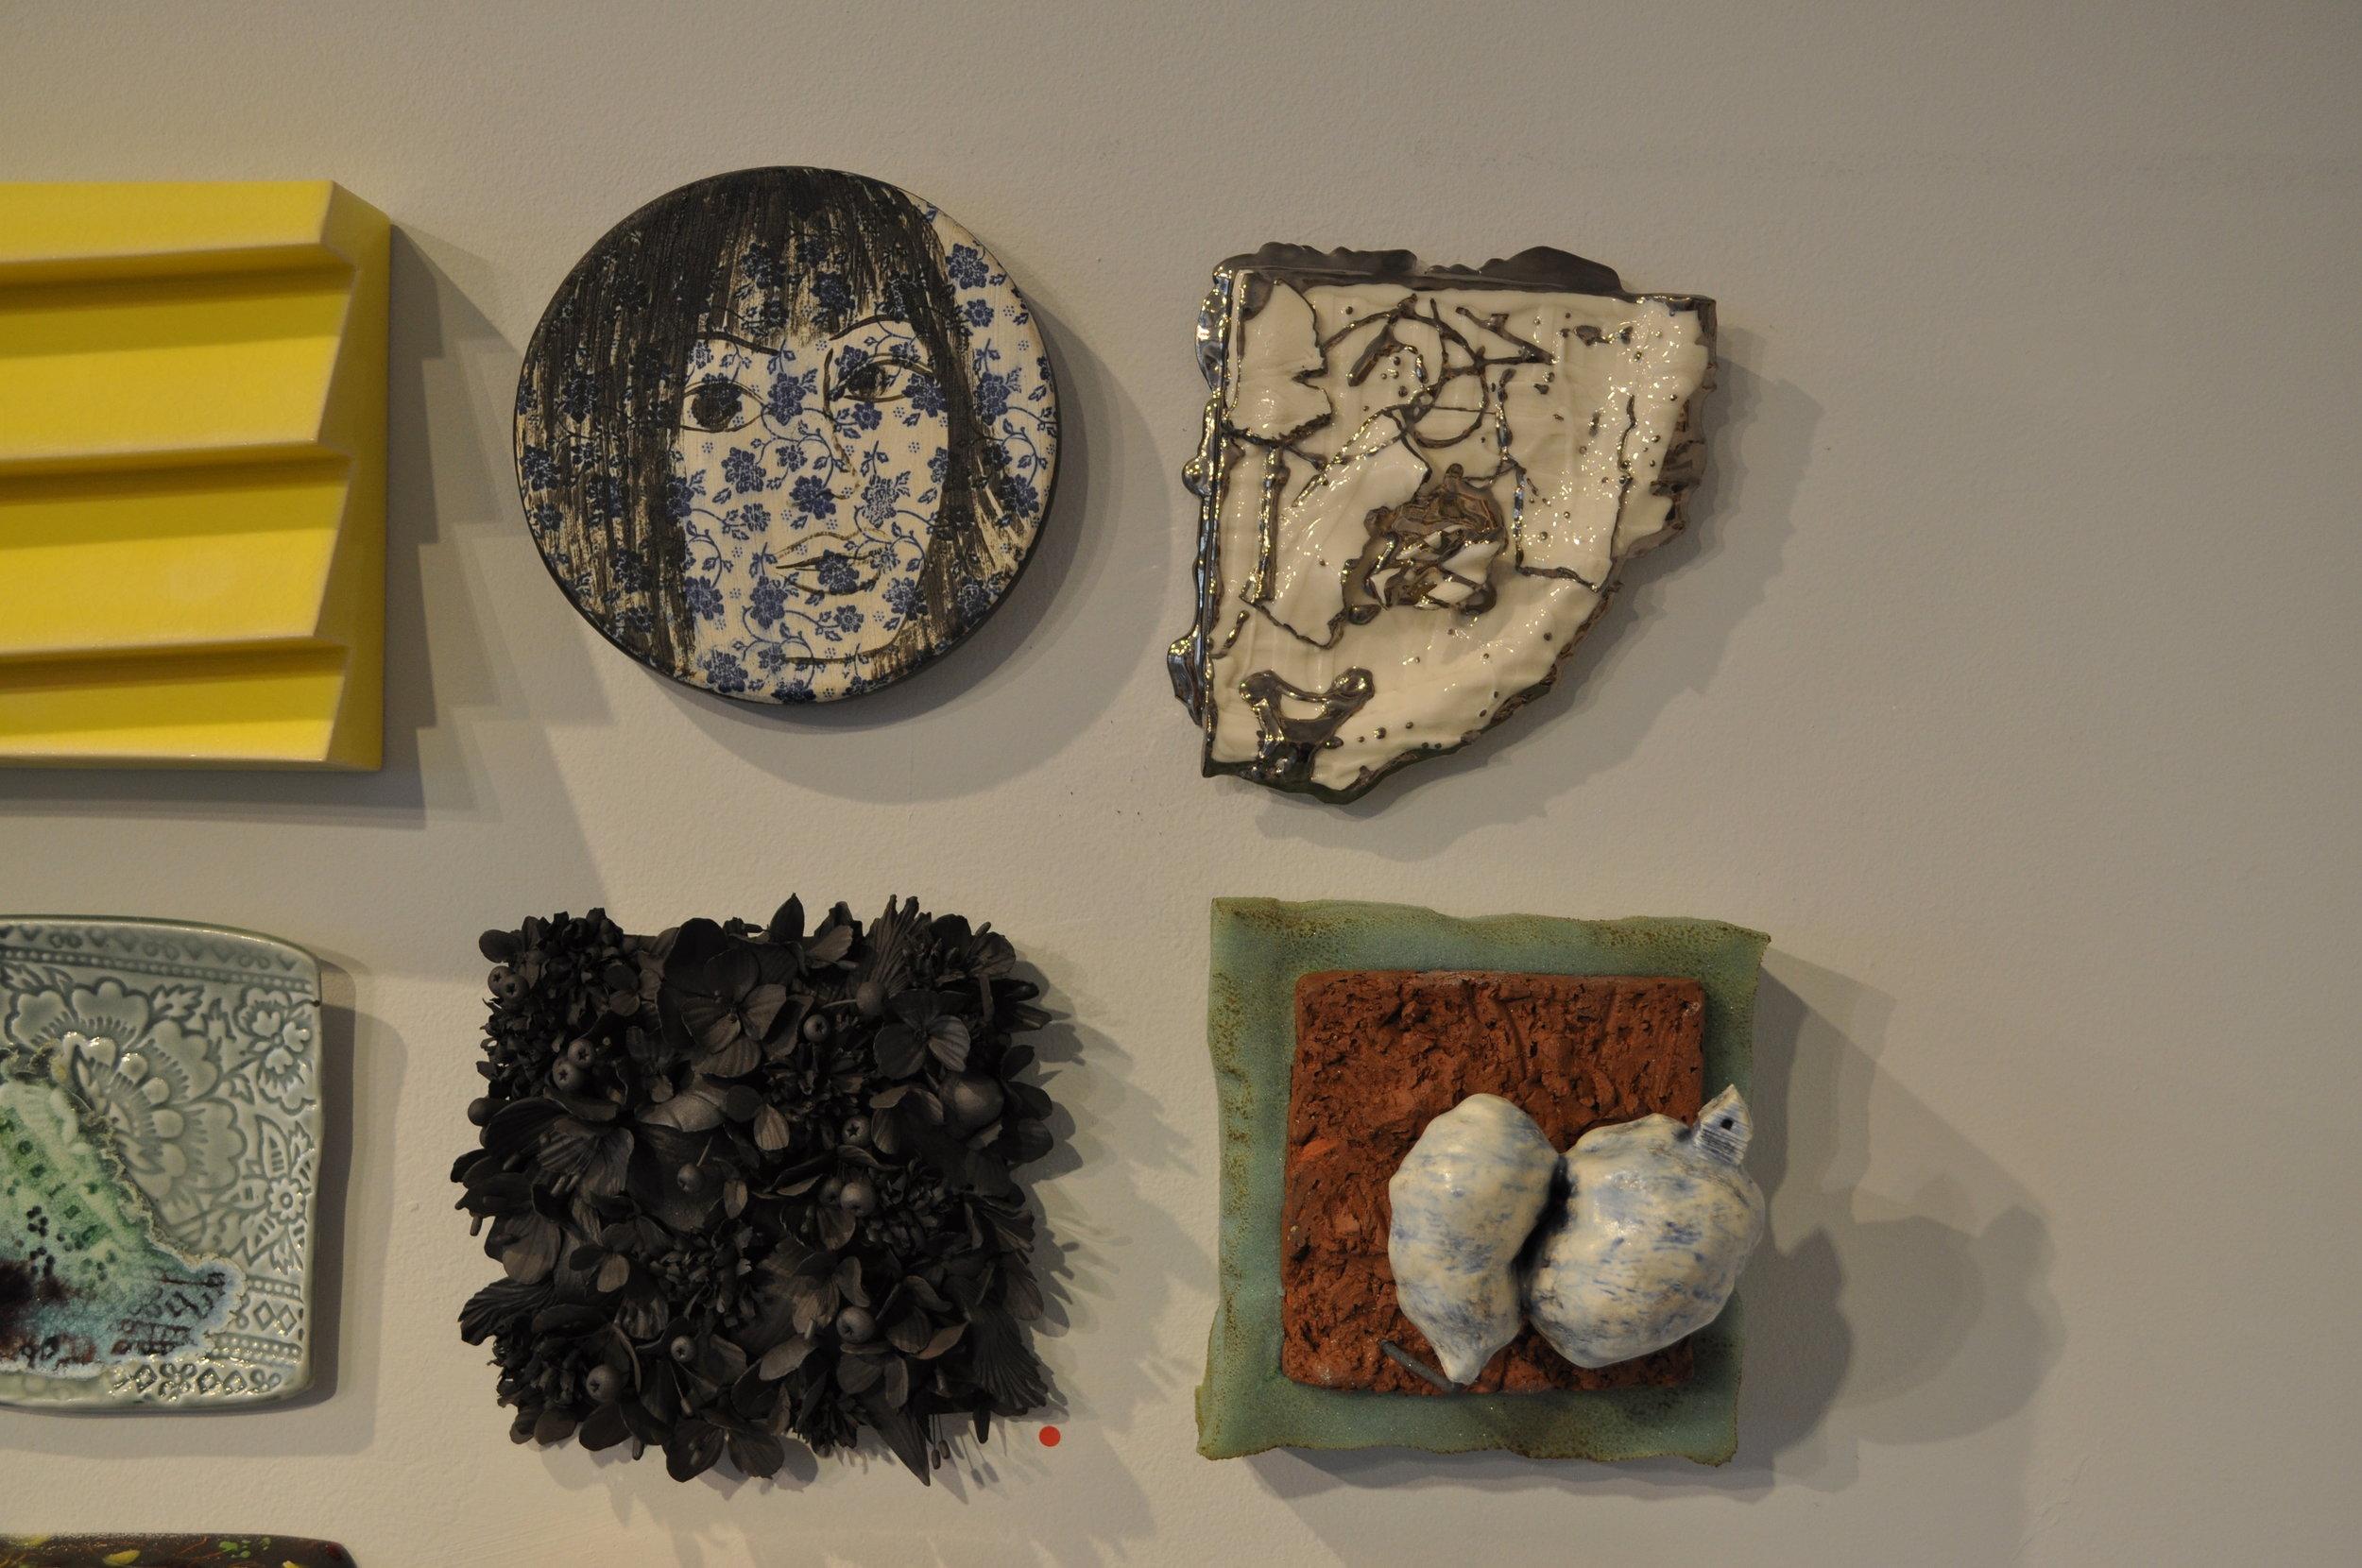 1.  Eva Kwong,  Wall Flower 1  $200  2.  Heather Mae Erickson,  Tile: From perfect imperfection collection: Bird series  $150  3. Rain Harris,  Jardin Noir 2  (SOLD)  4.  Rick Parsons,  Shotgun House  $200